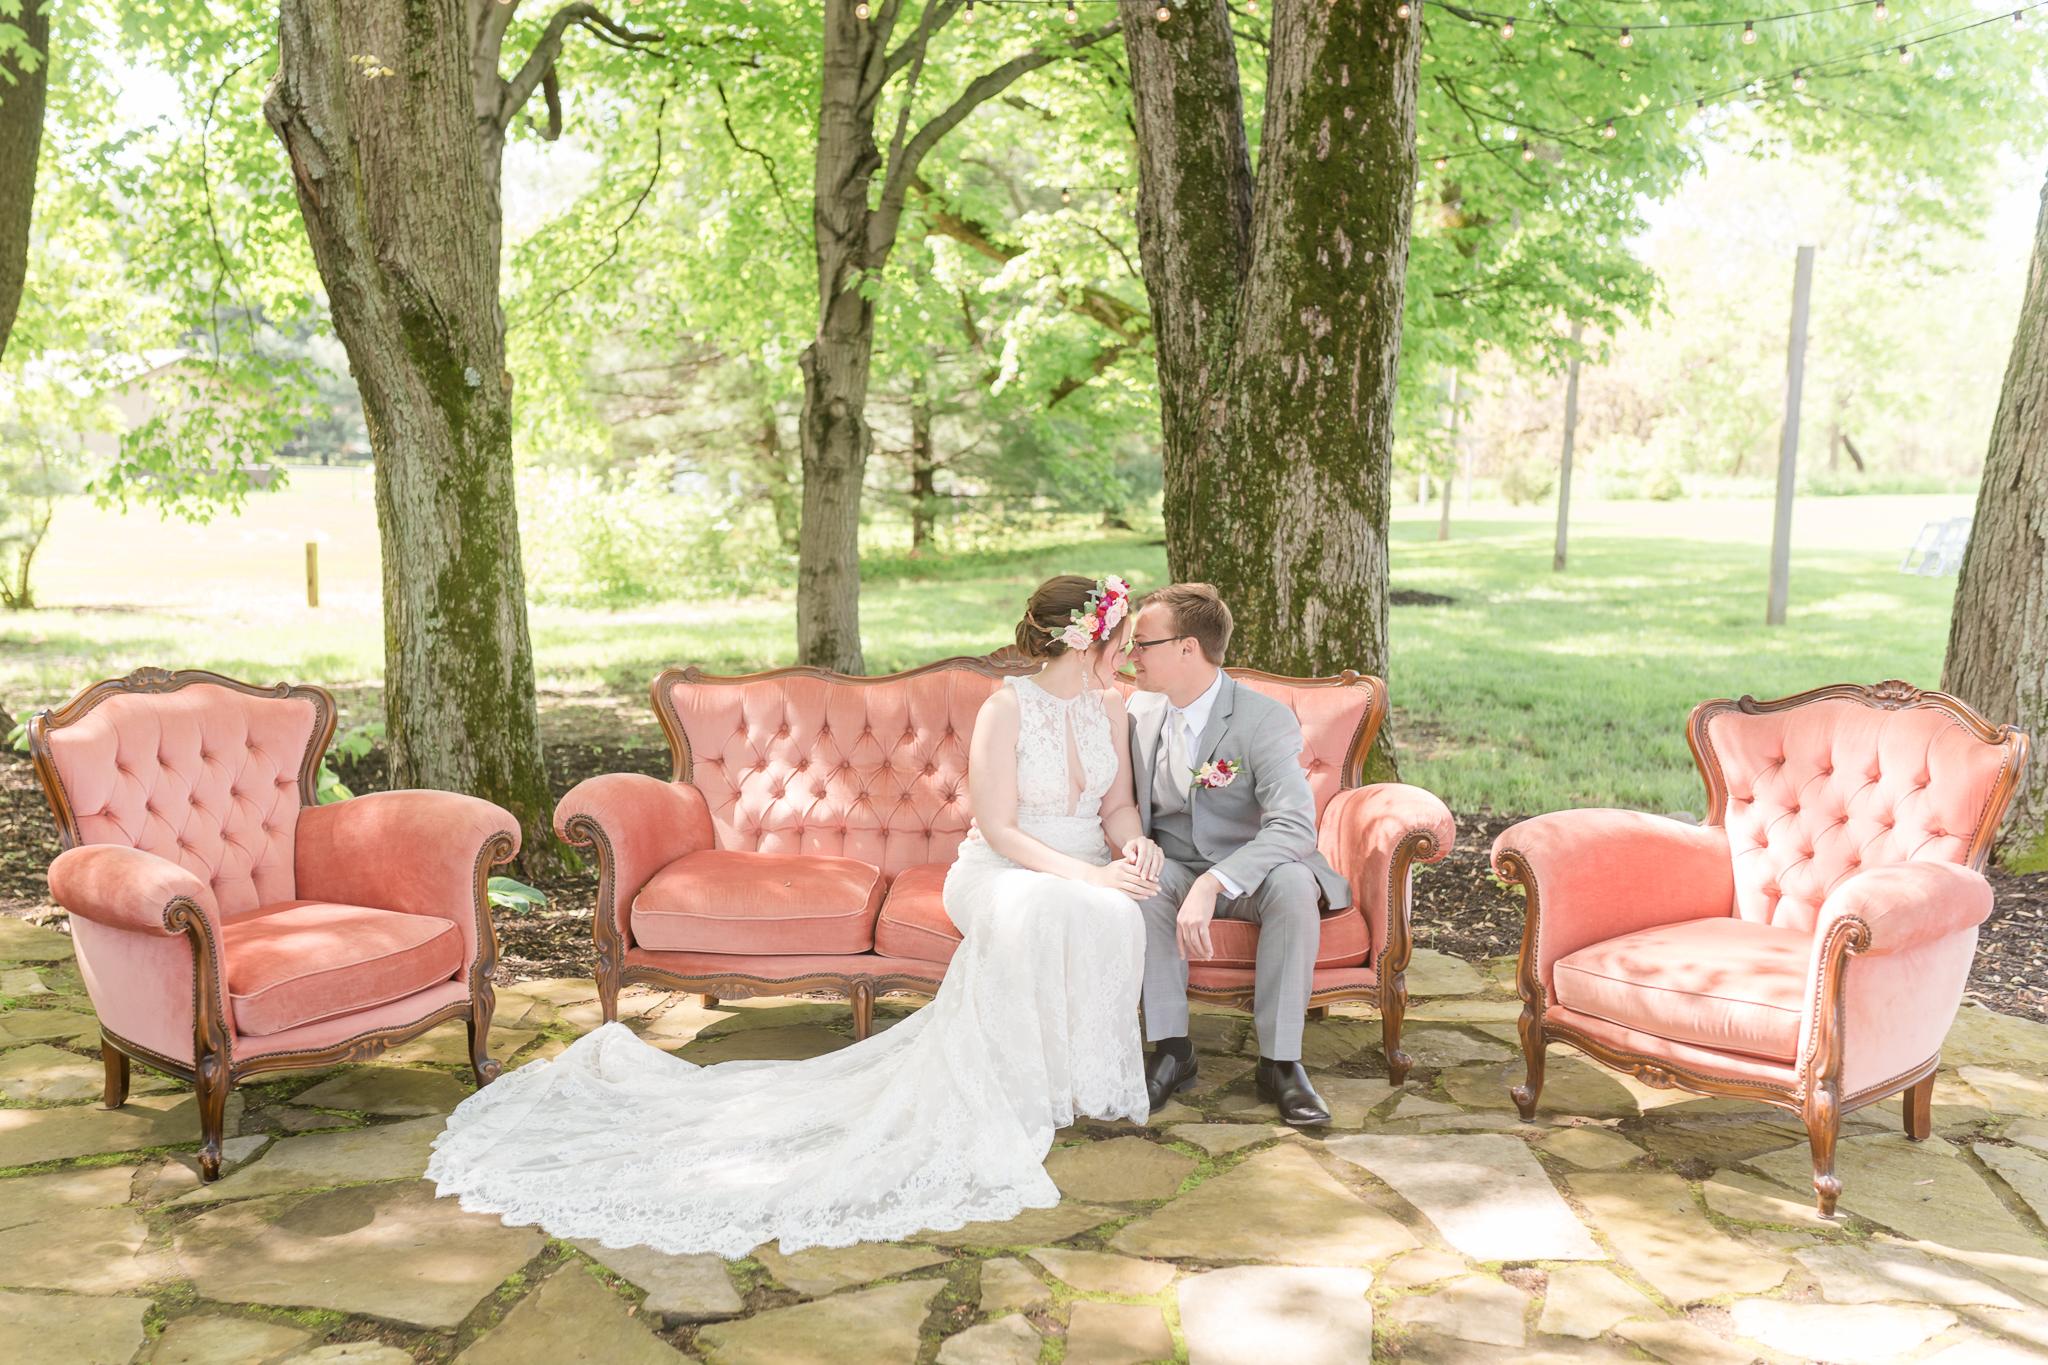 Mustard Seed Gardens Wedding Indianapolis Noblesvile Fishers Wedding Photographer-22.jpg